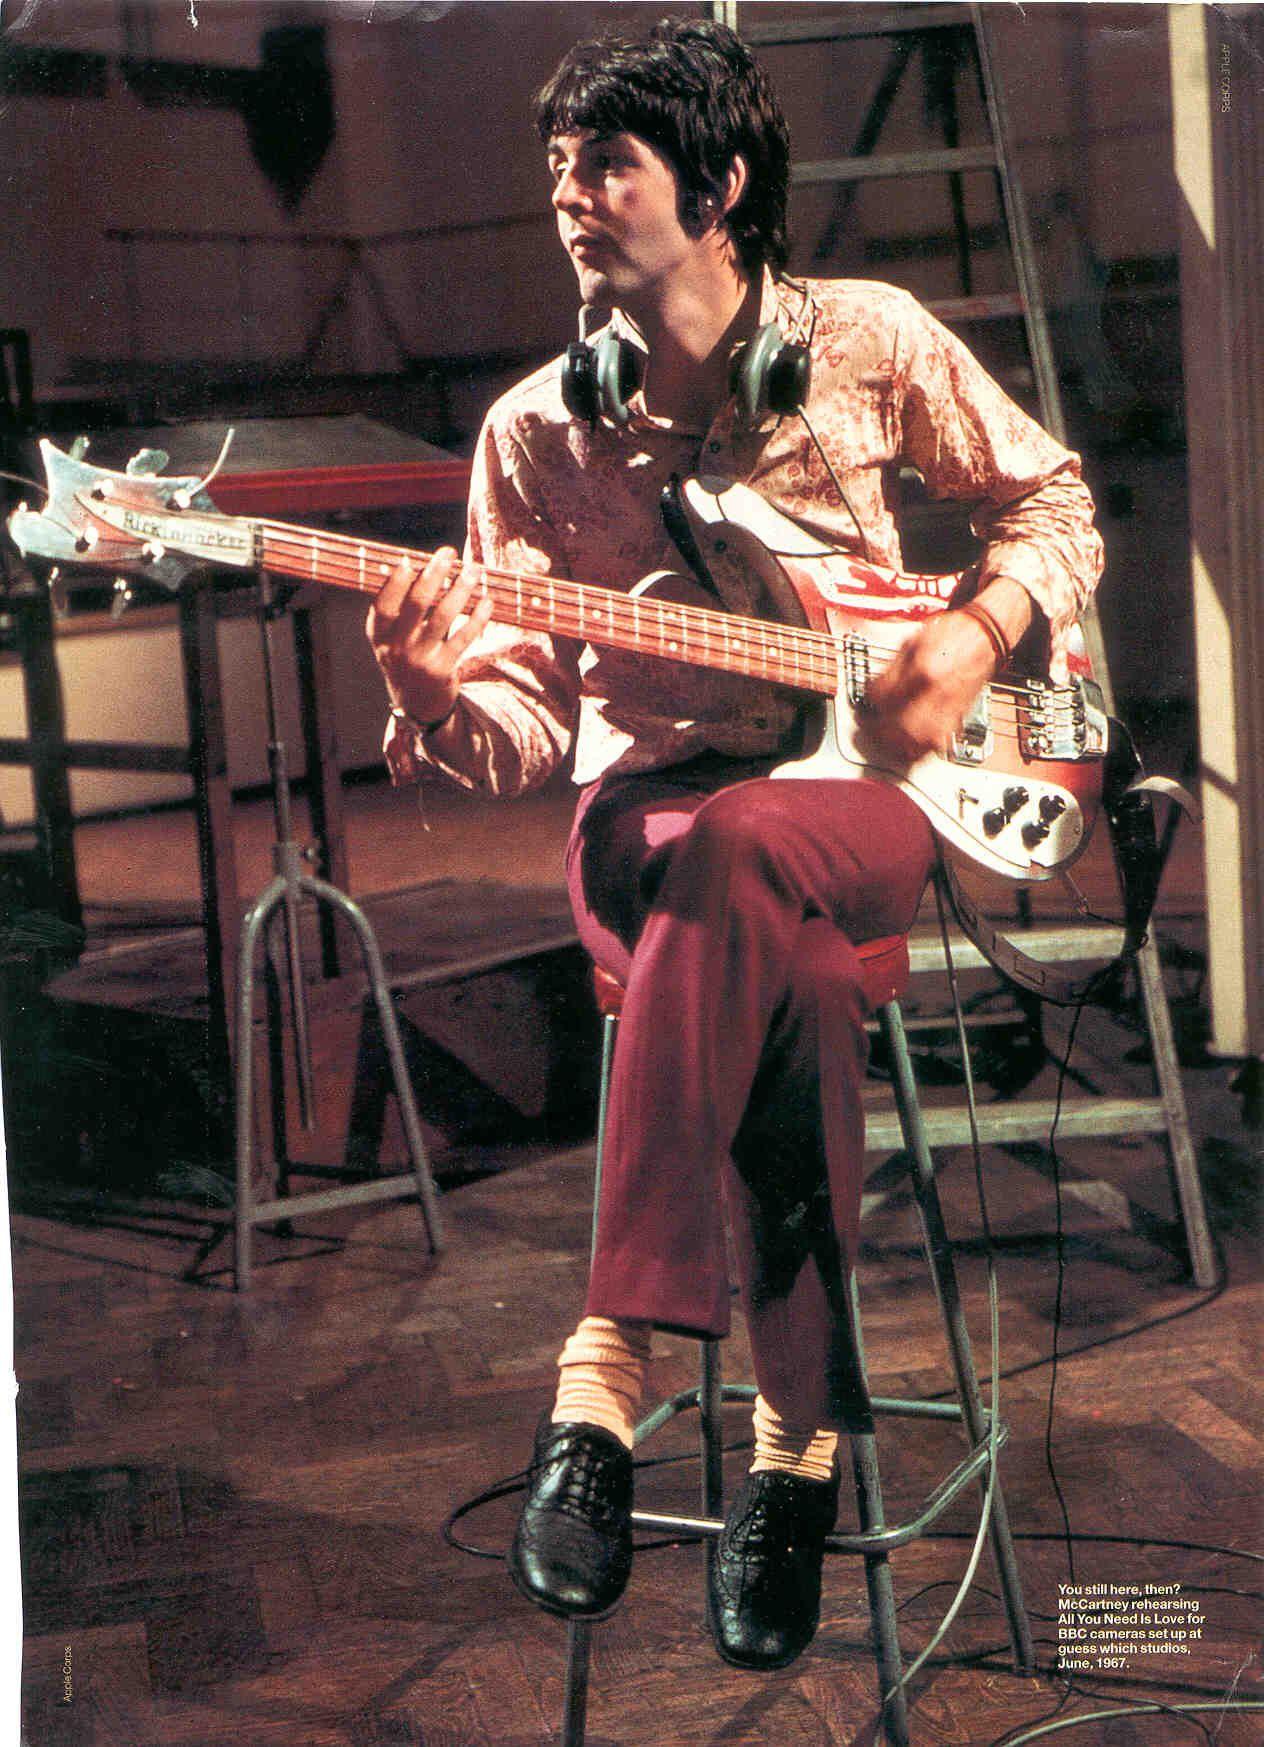 Paul McCartney 1967 Rickenbacker Bass All You Need Is Love Superb Beatles Photo